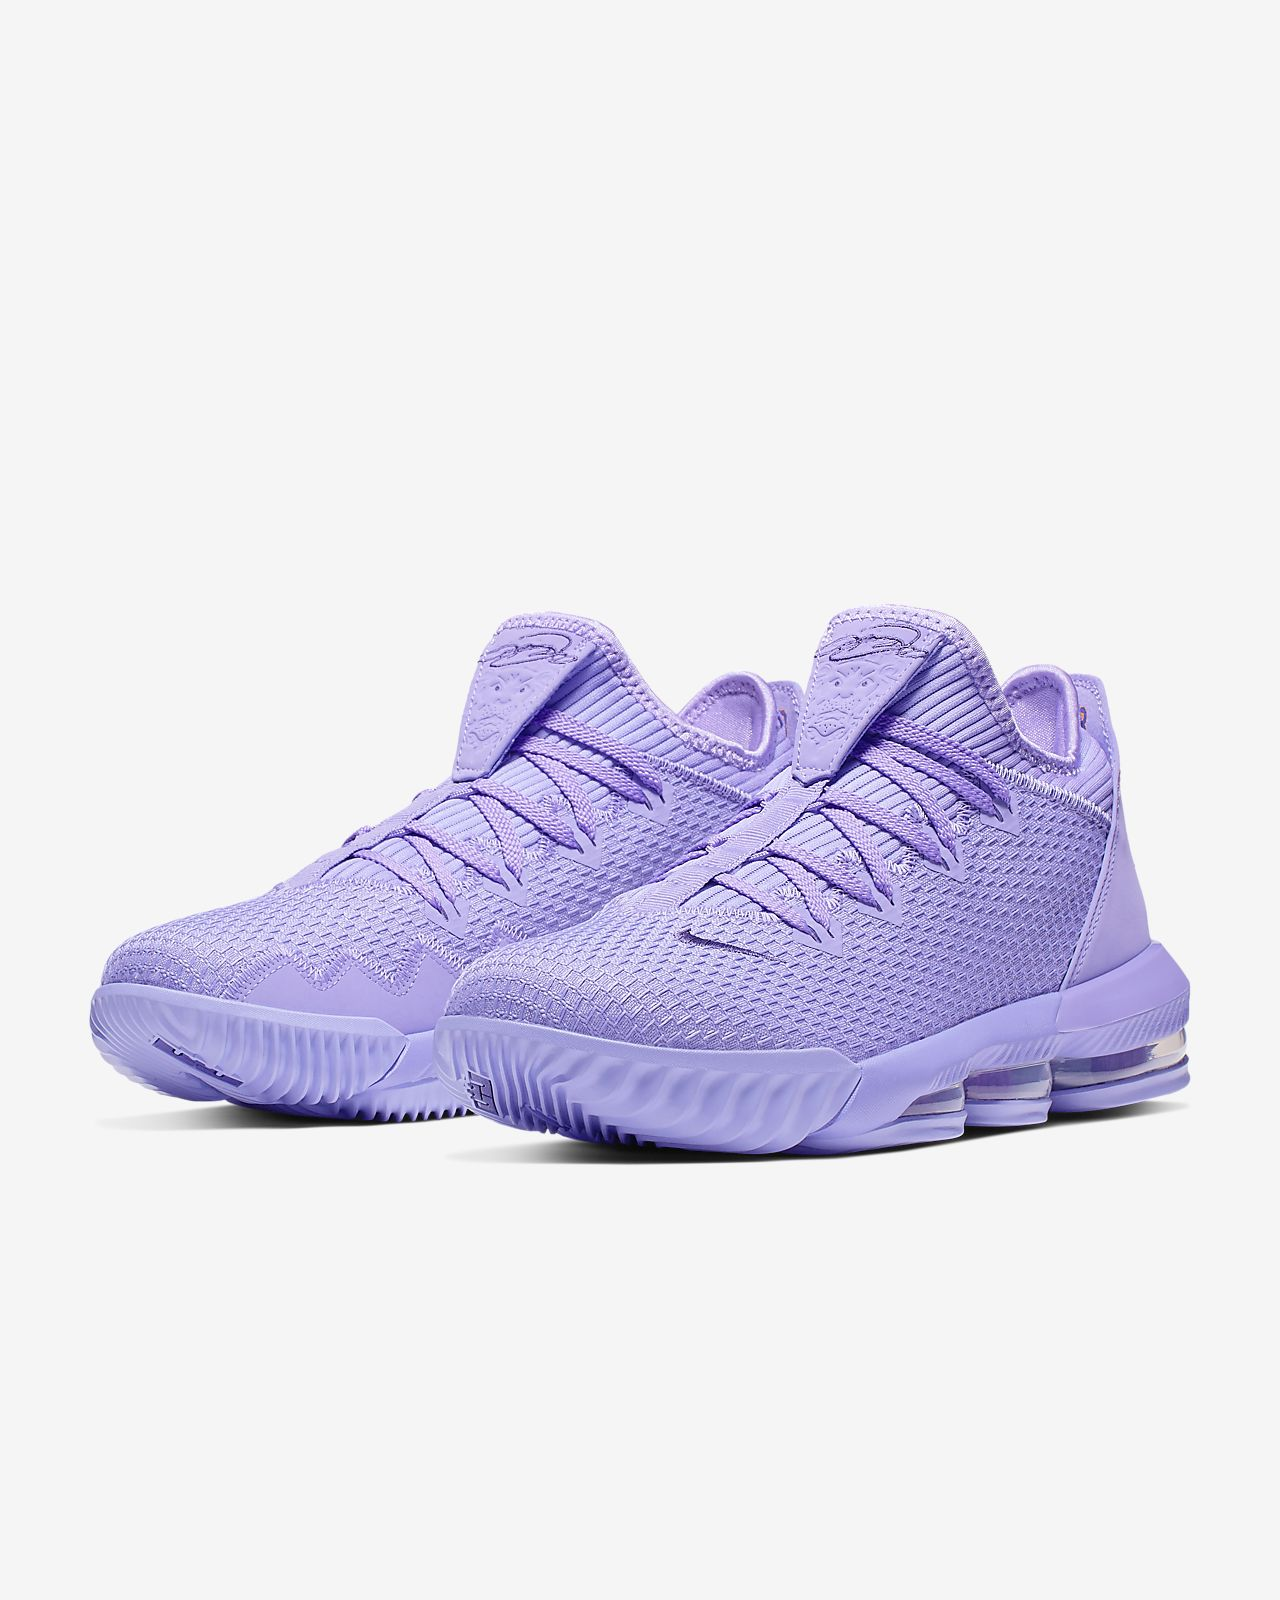 premium selection 45a68 10c74 LeBron 16 Low Basketball Shoe